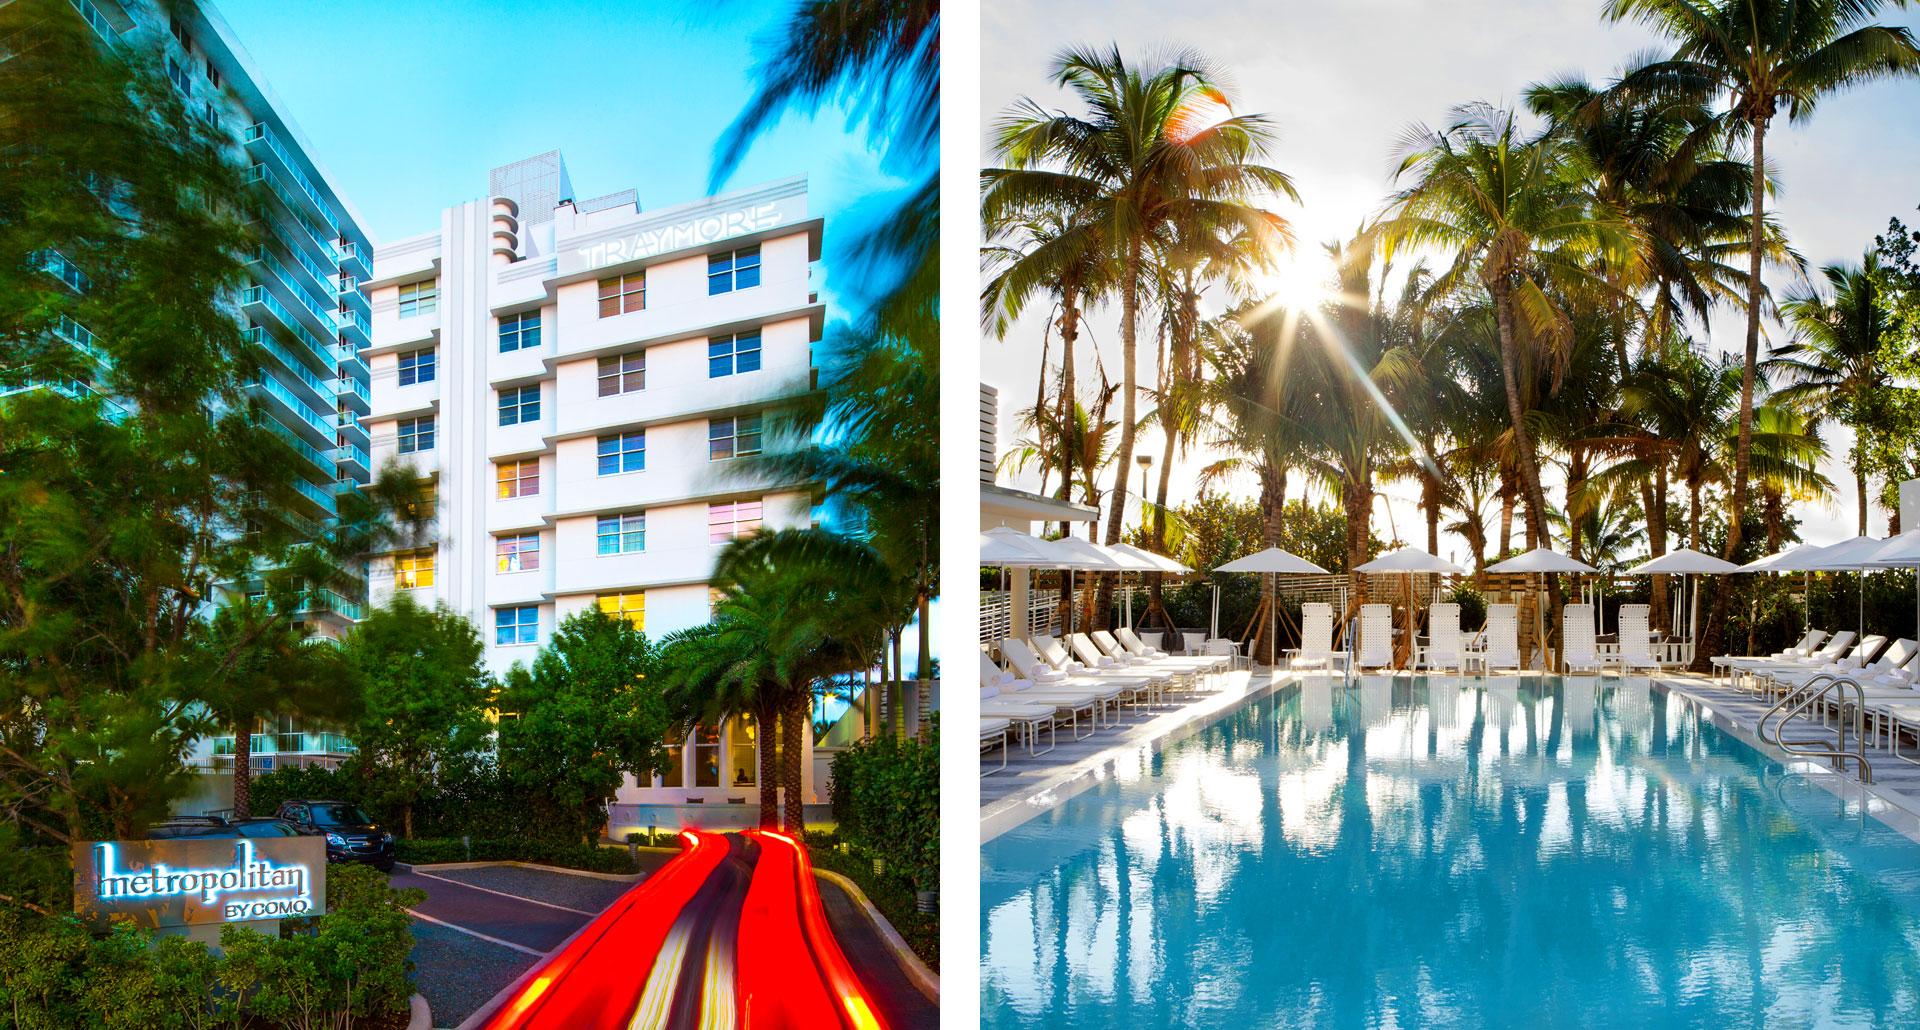 Como Metropolitan - boutique hotel in Miami